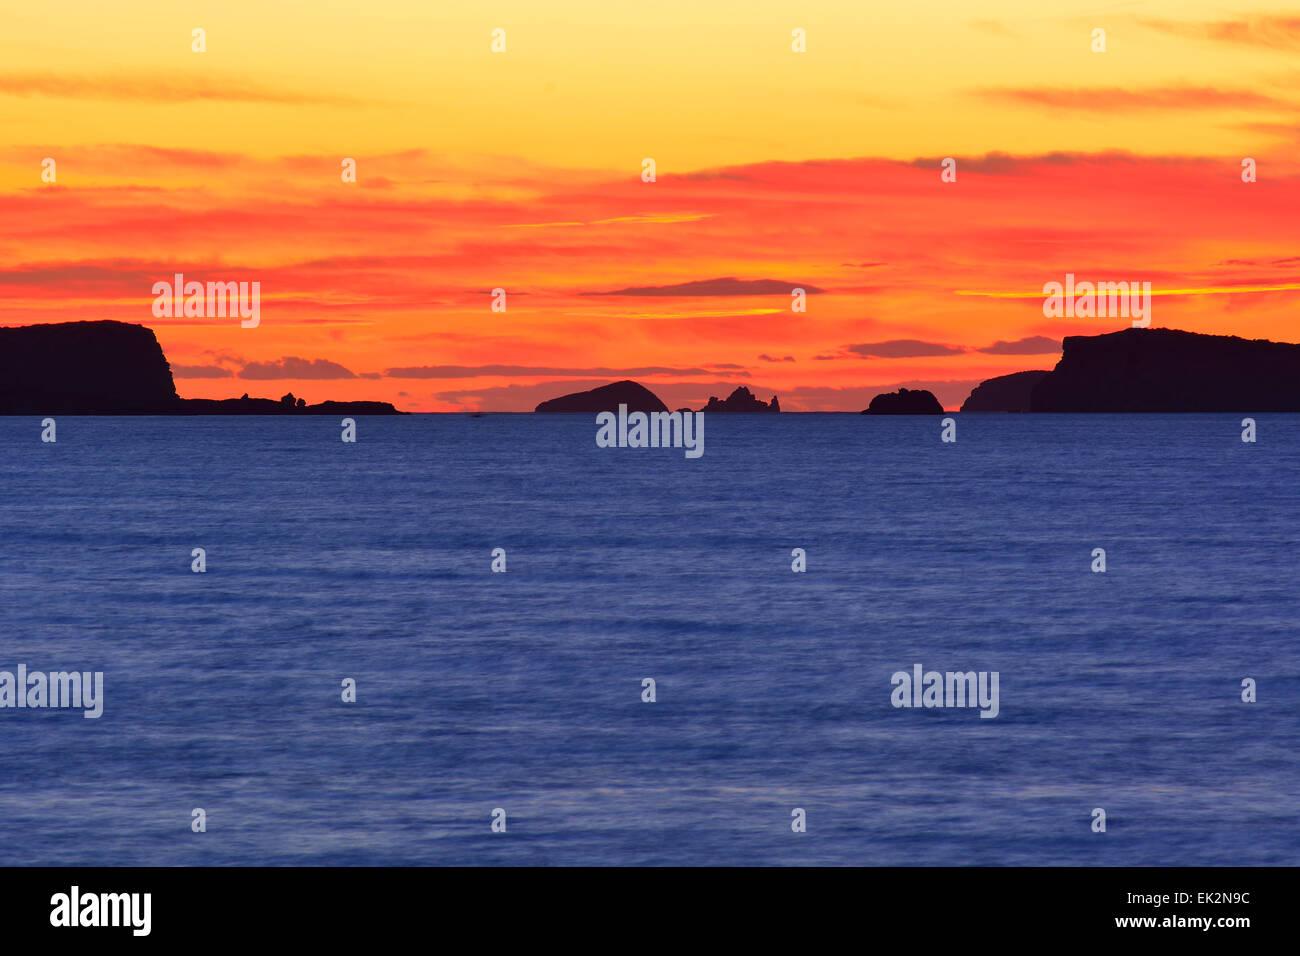 Sonnenuntergang in Ibiza, Spanien Stockbild